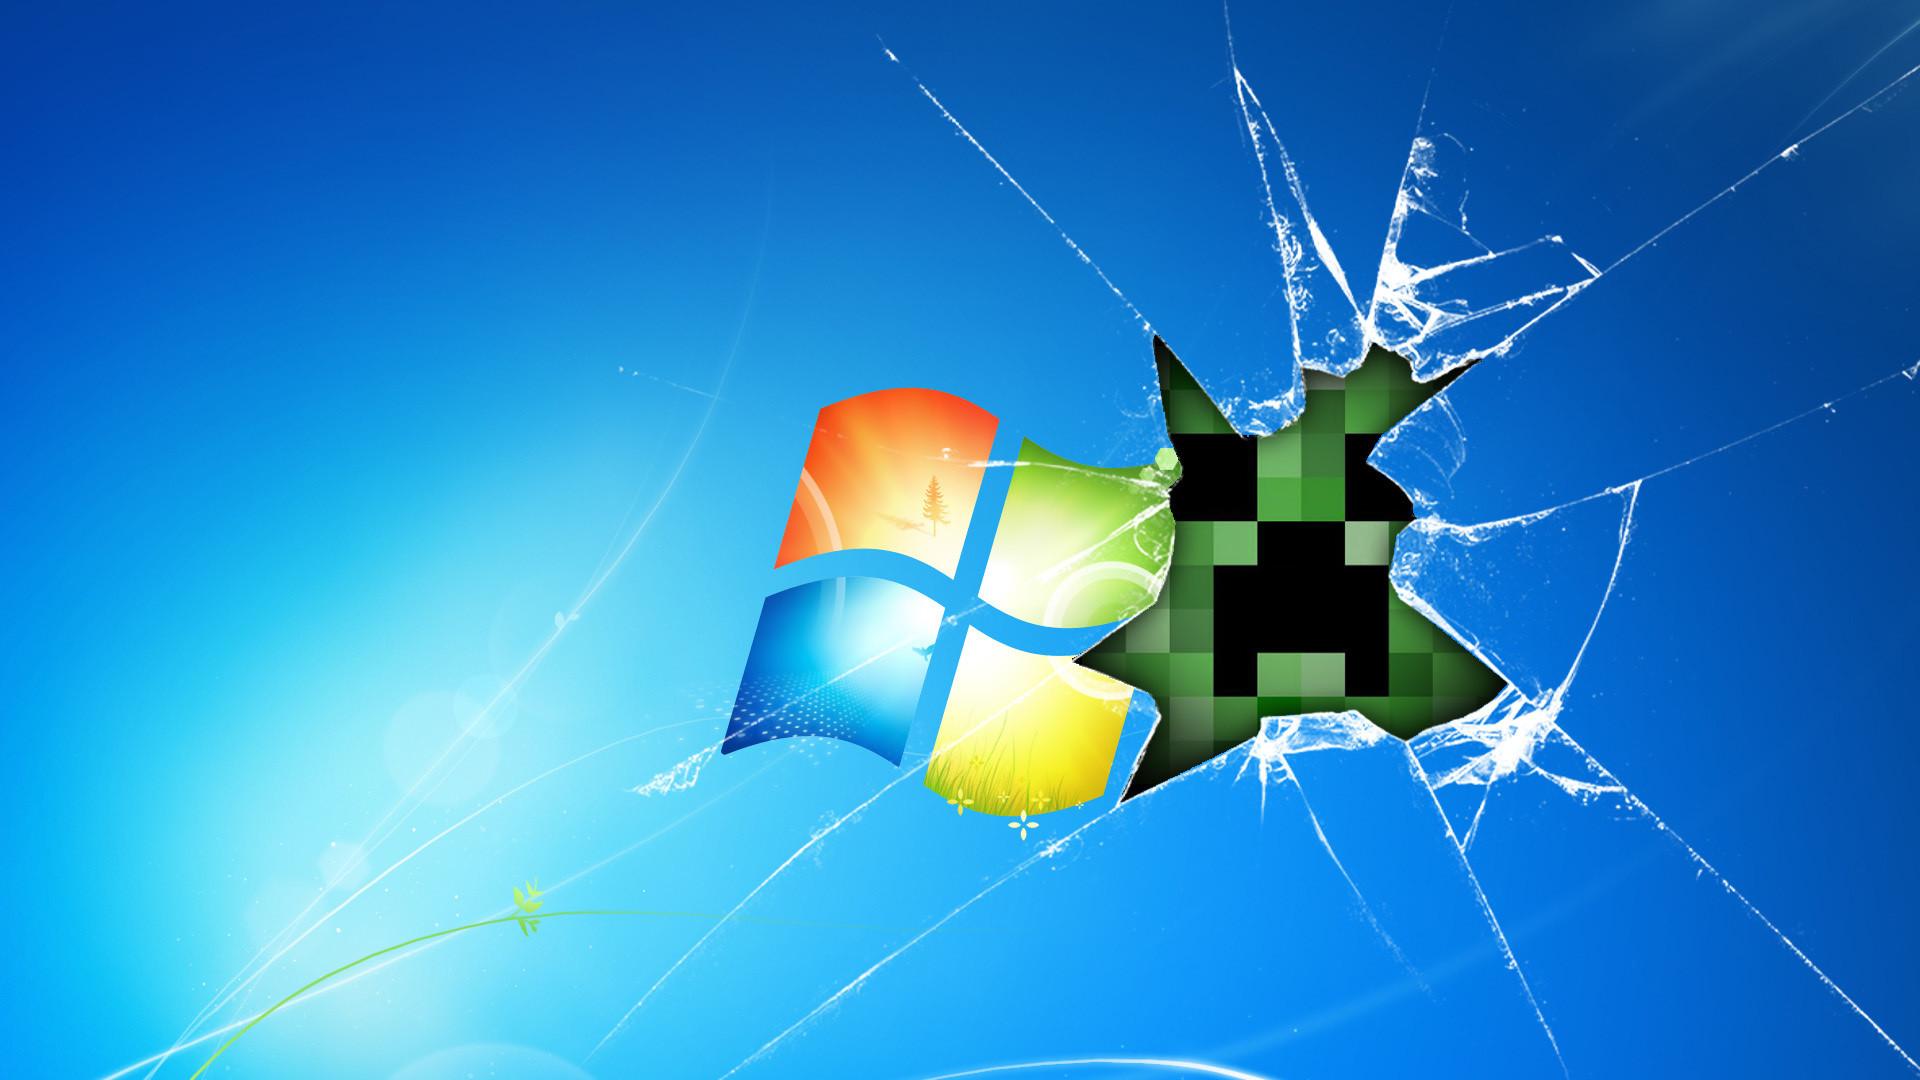 Download Wallpaper Windows, Minecraft, Game, Glass, Desktop Full  HD 1080p HD